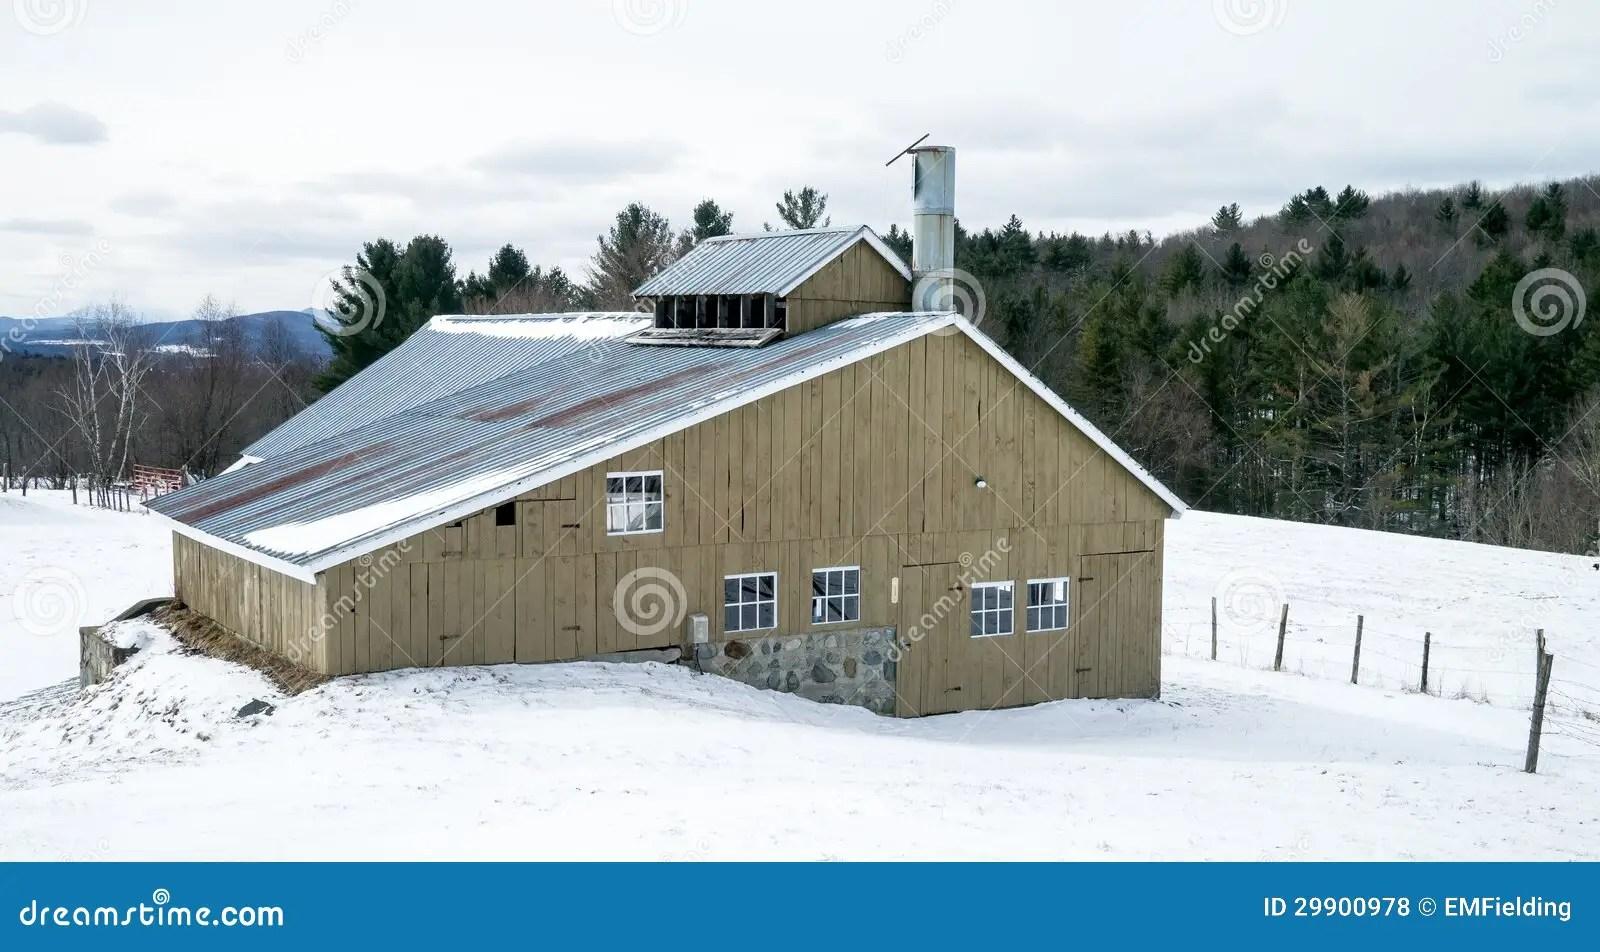 Maple Sugar Shack Design Plans